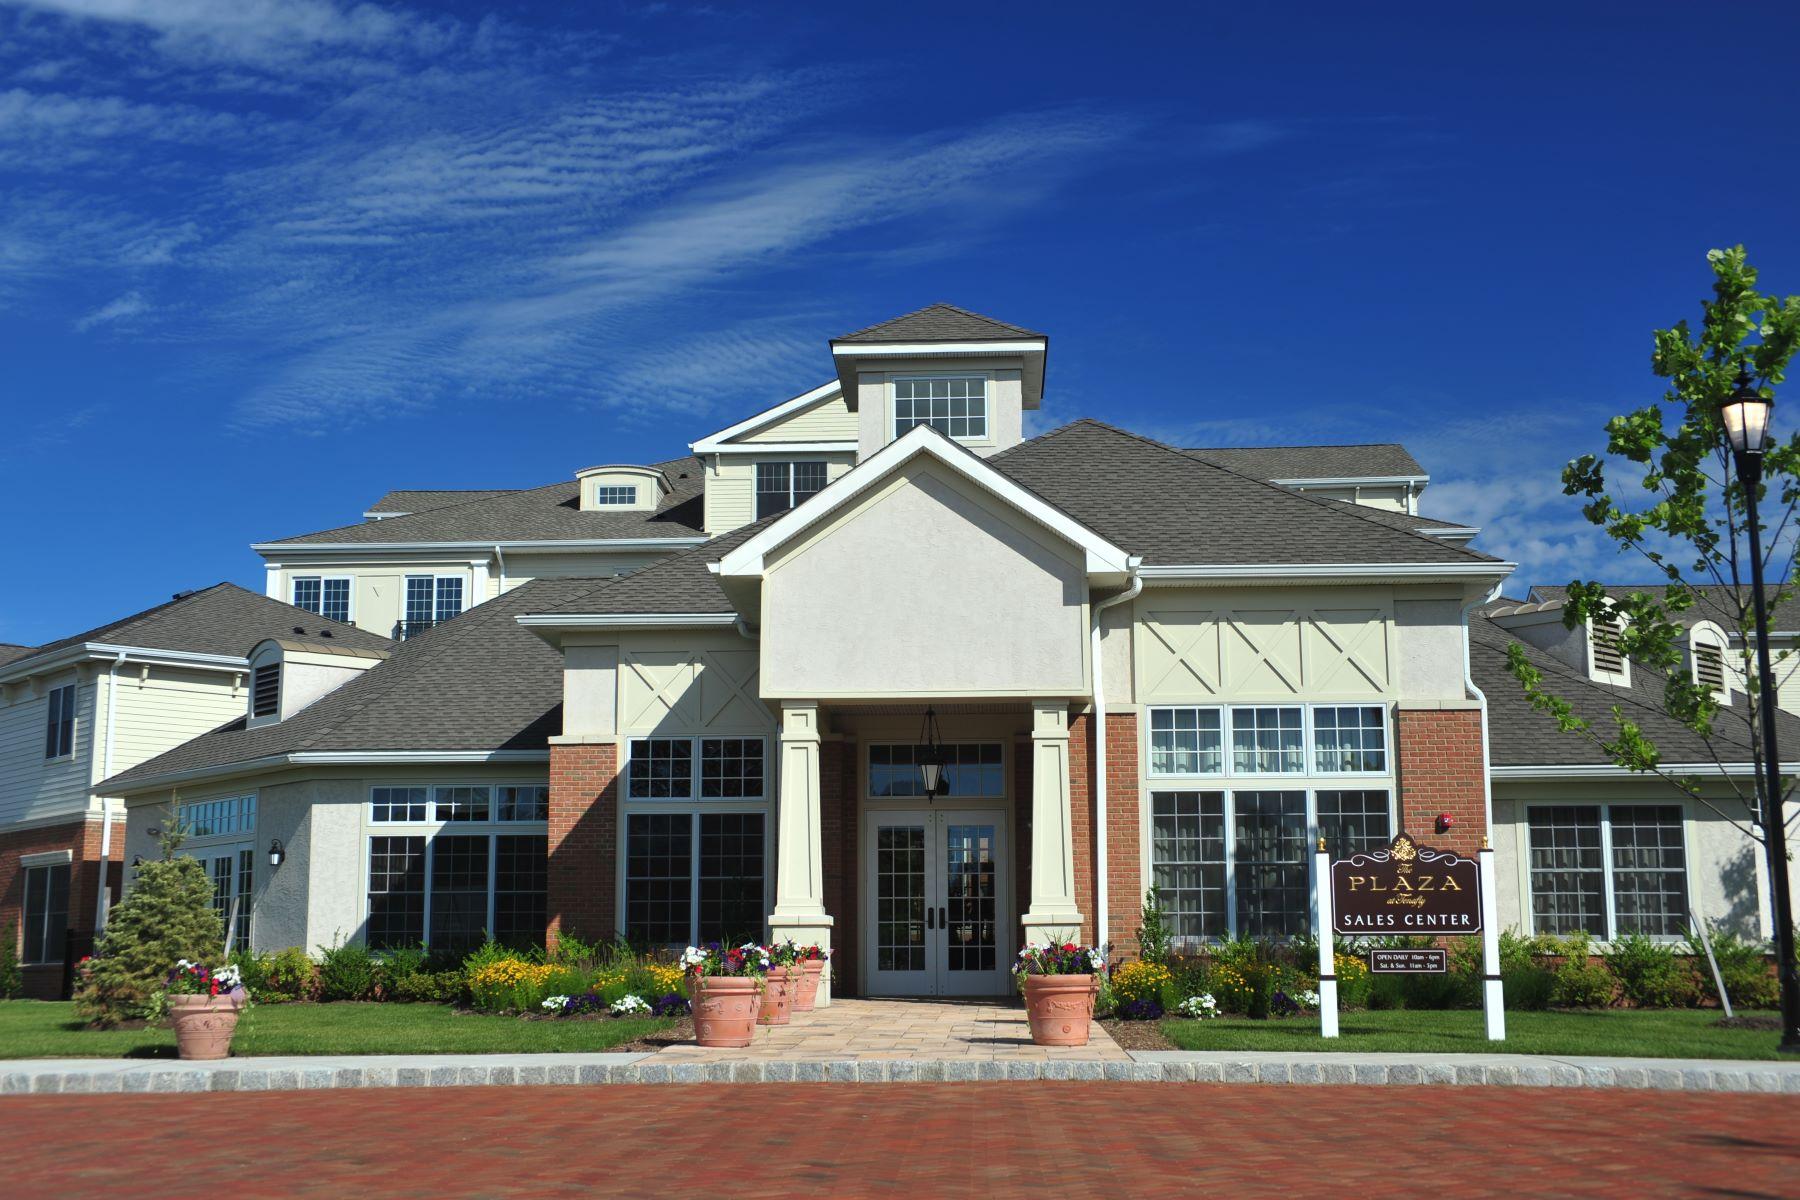 تاون هاوس للـ Rent في Elegant Country Club Style Rental 1315 The Plaza Tenafly, New Jersey, 07670 United States